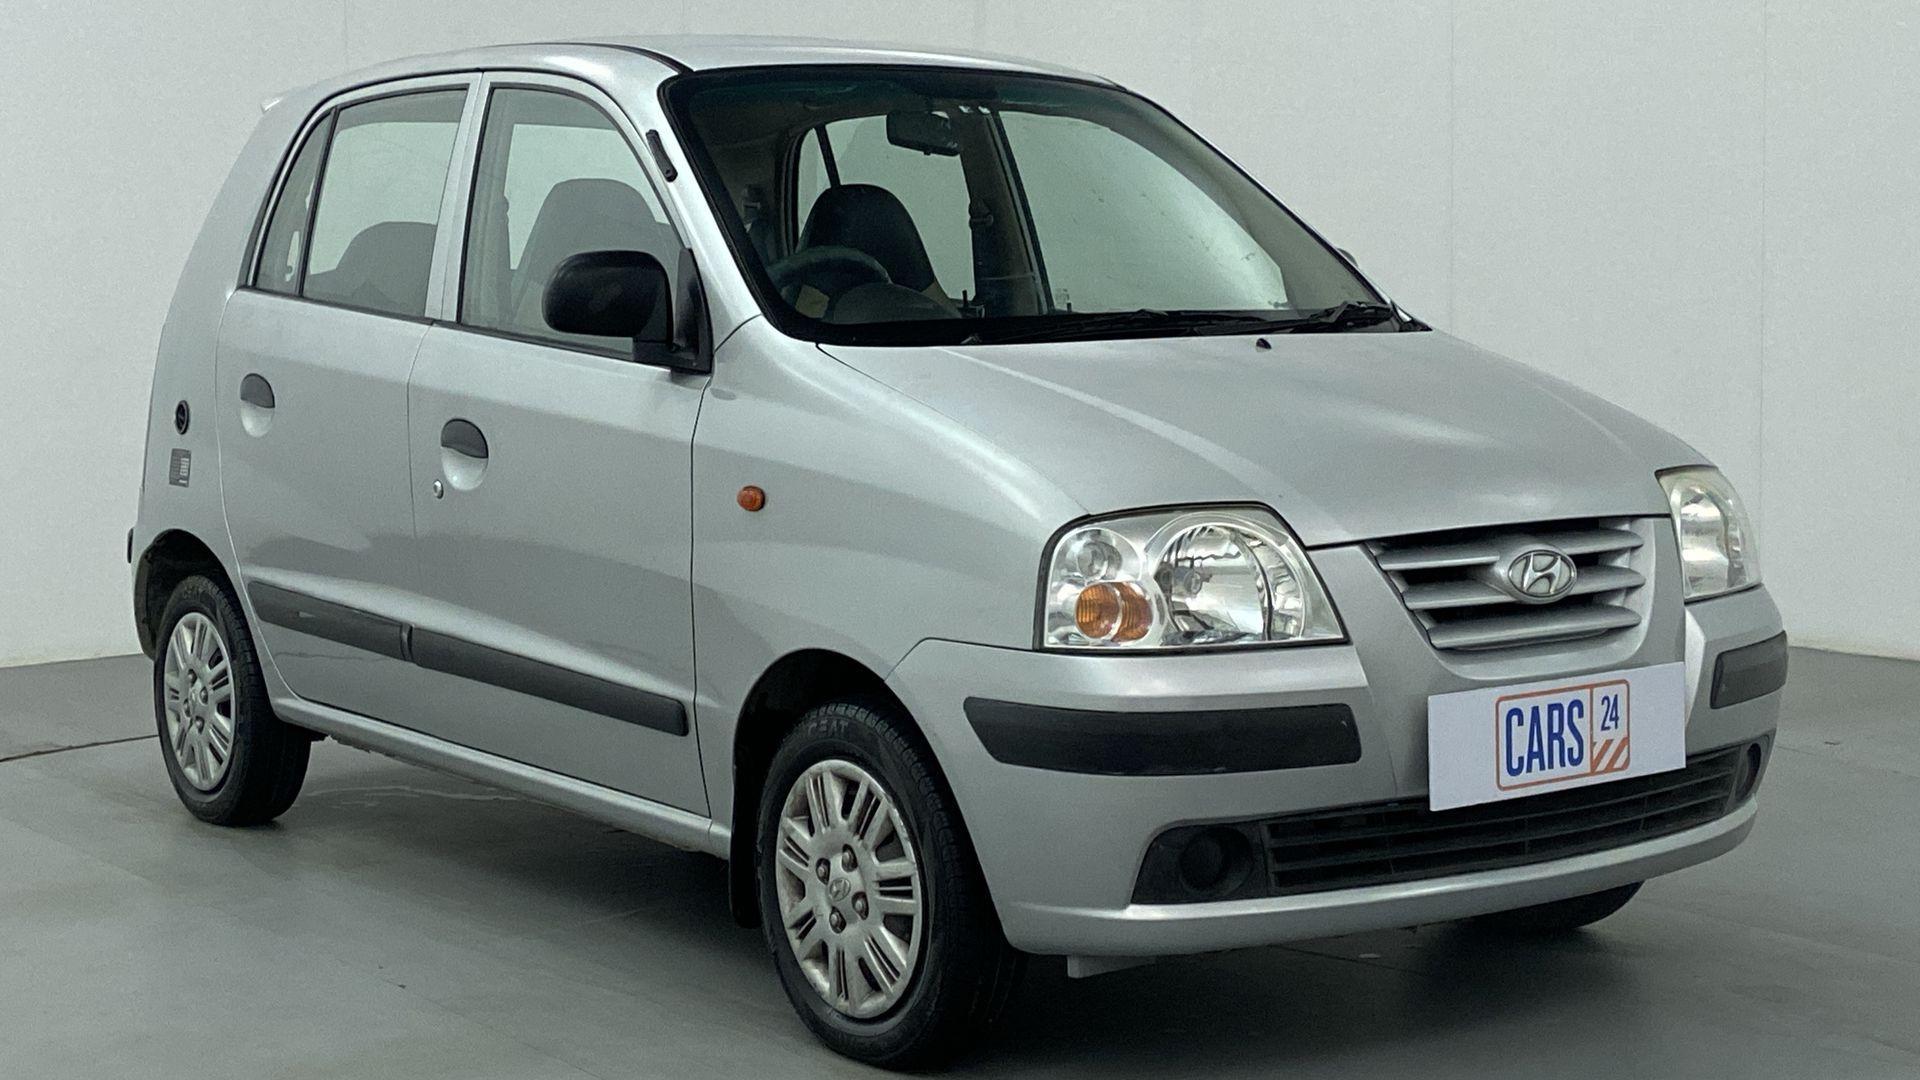 2010 Hyundai Santro Xing GLS LPG